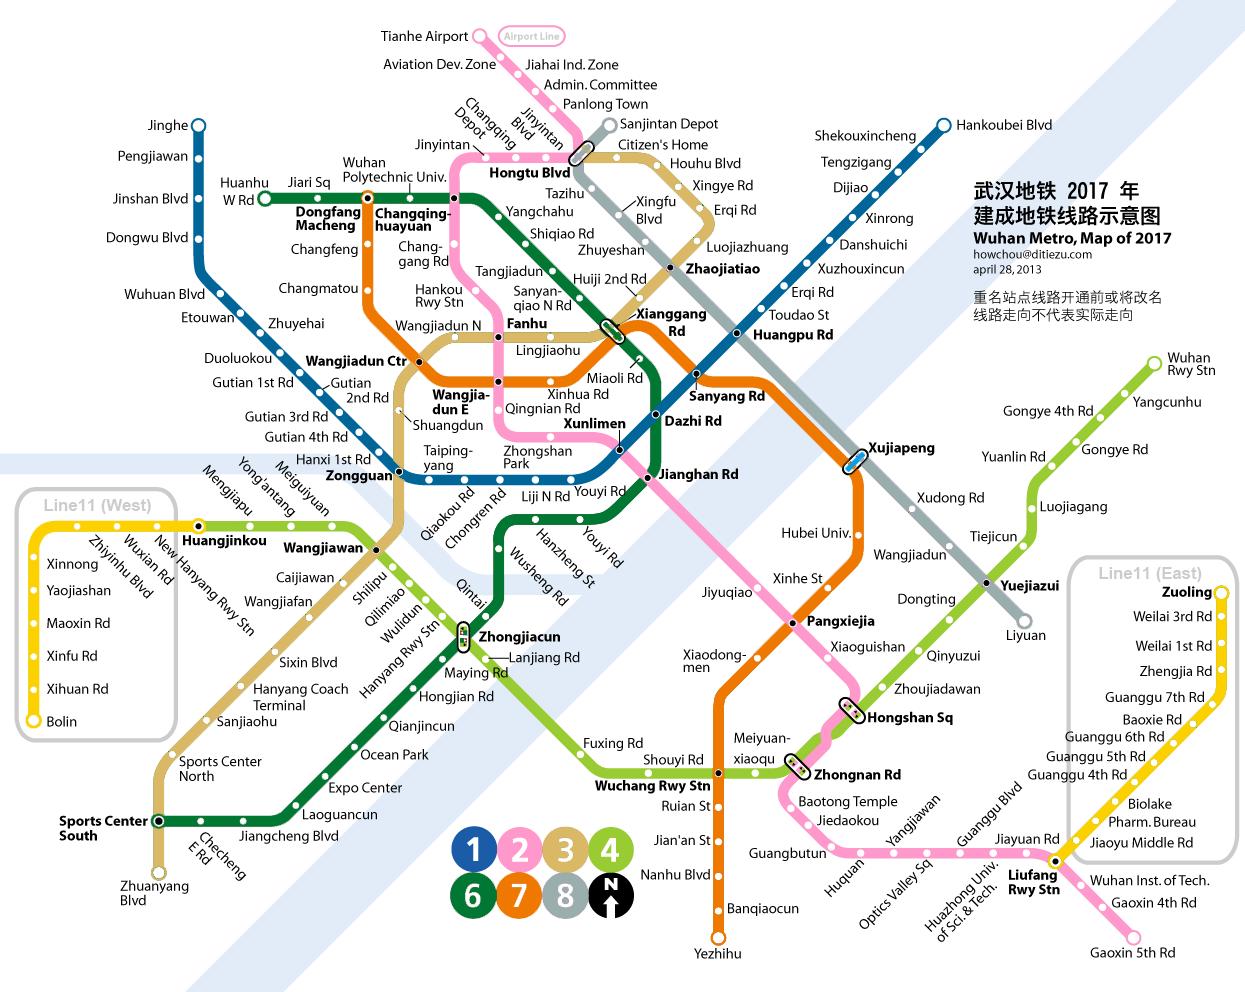 wuhan_metro_map_of_2017_in_english.png